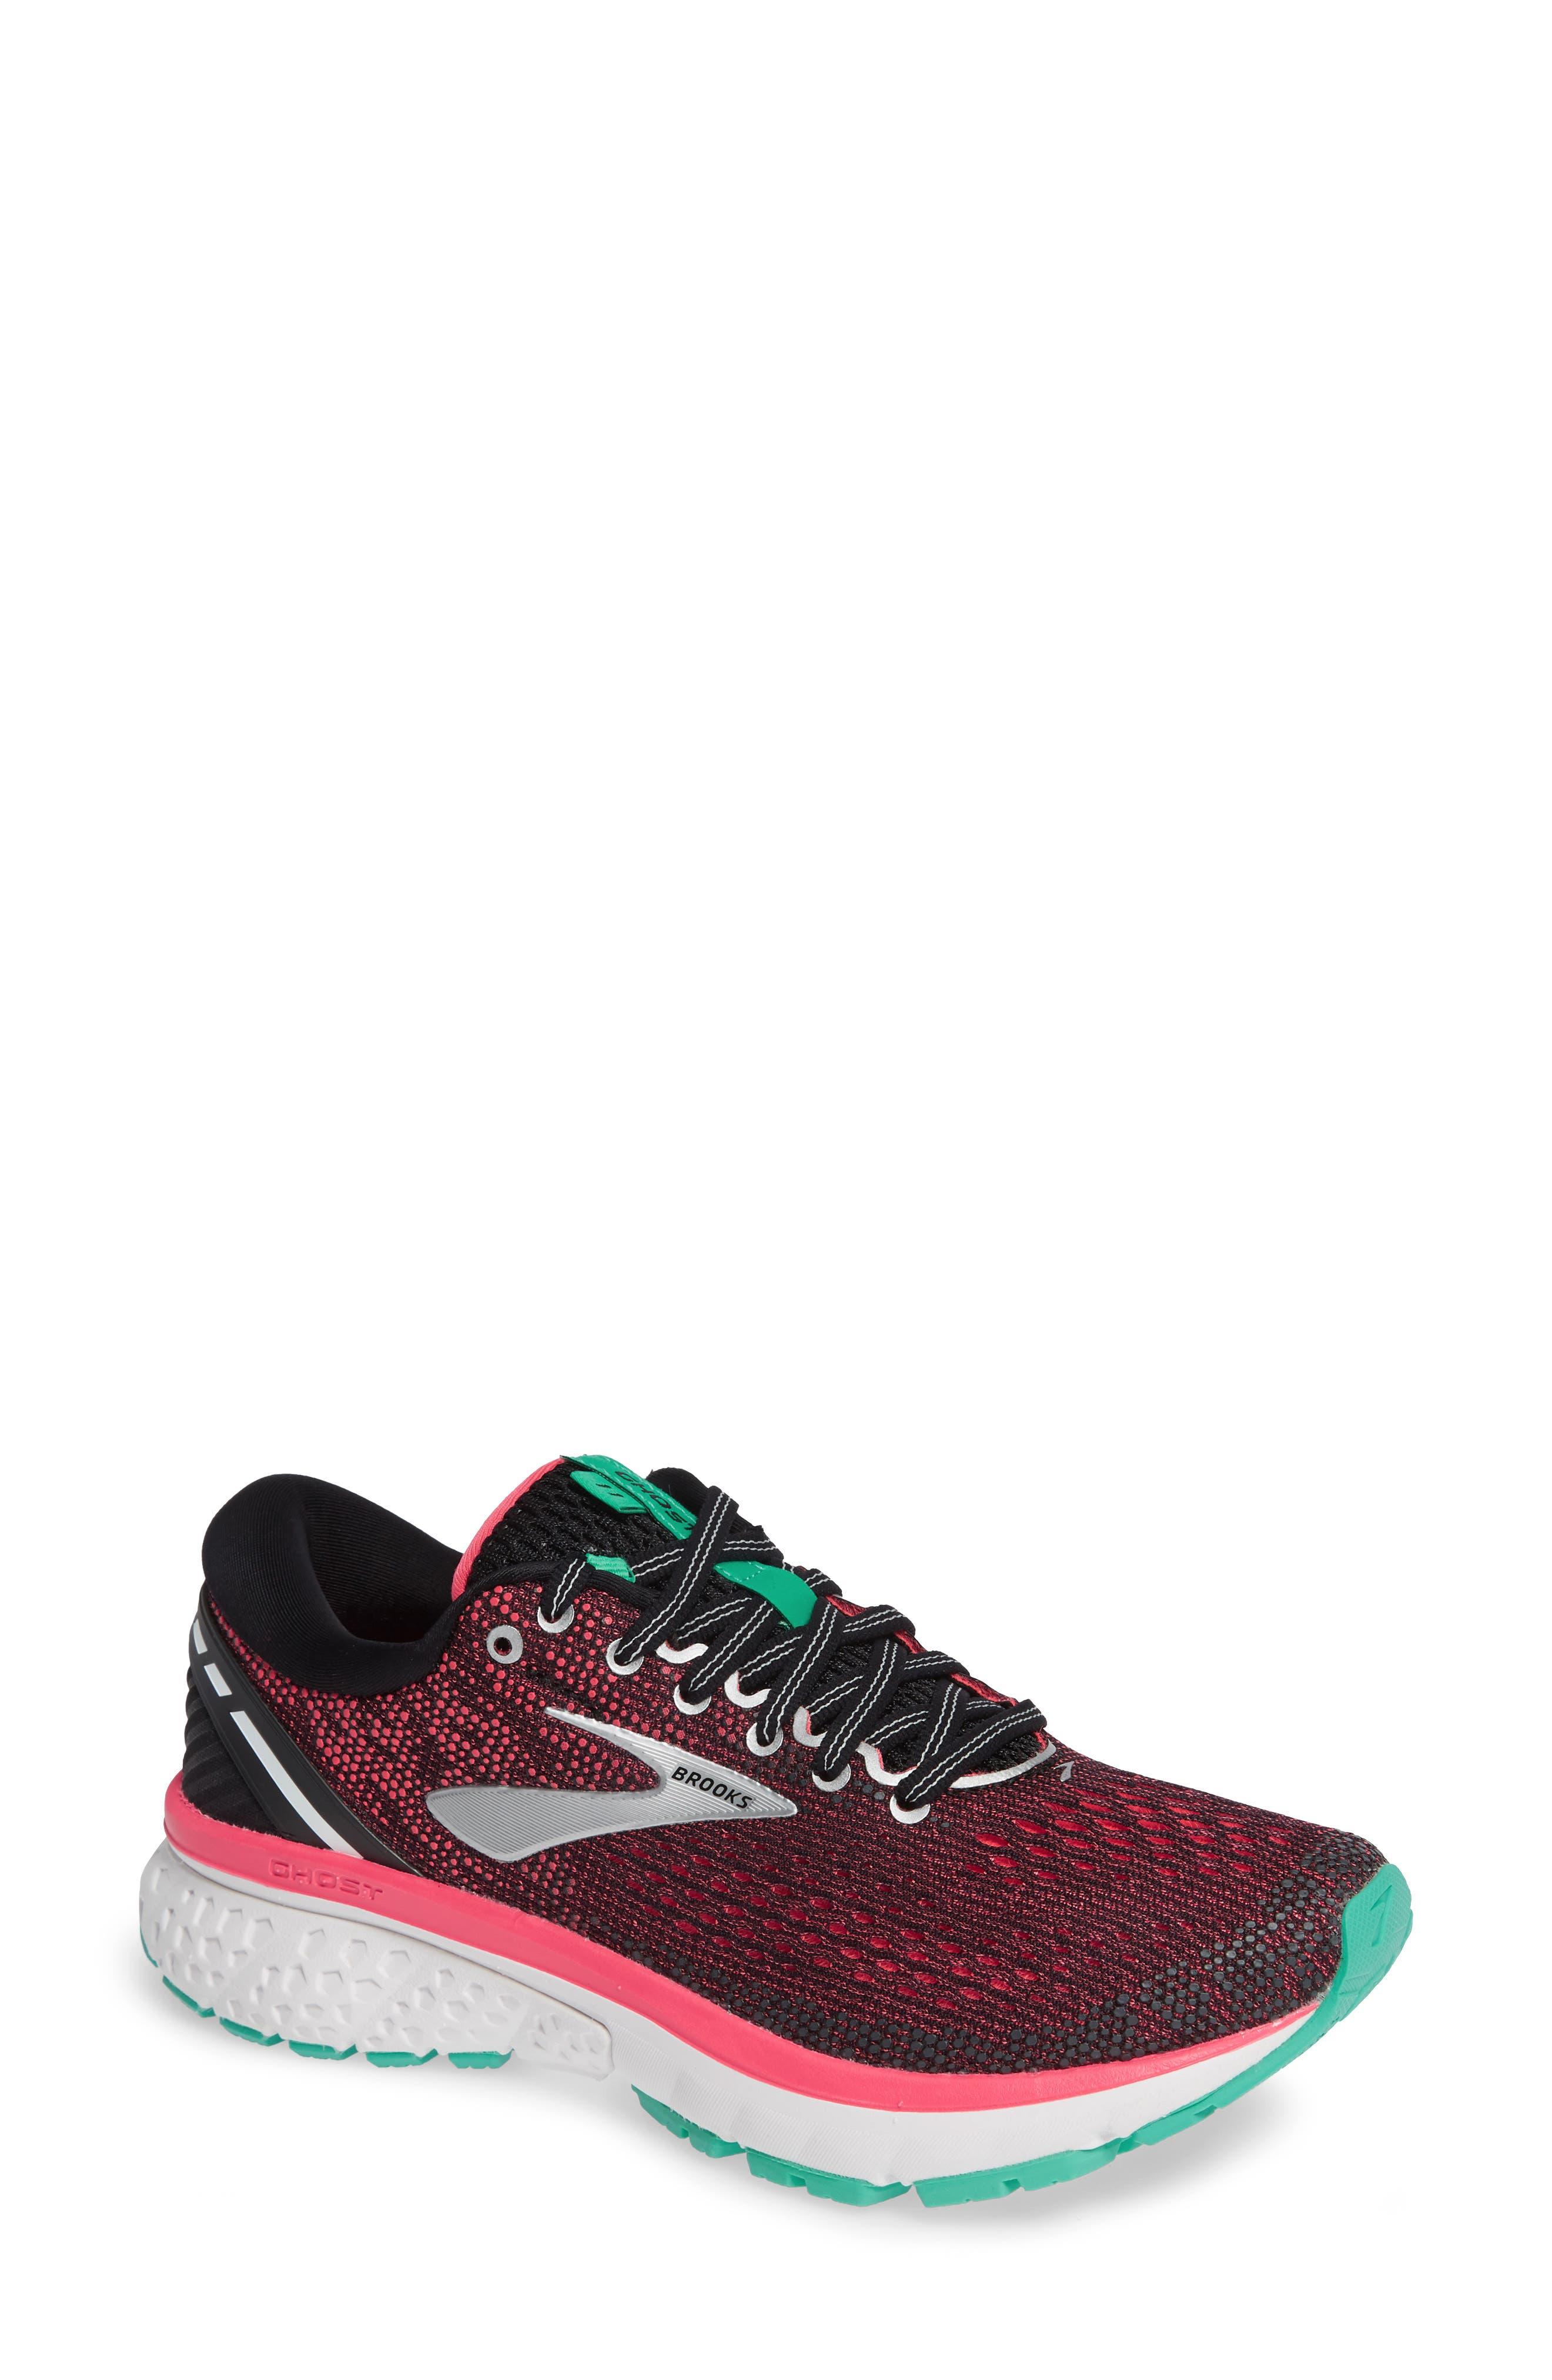 Brooks Ghost 11 Running Shoe B - Pink